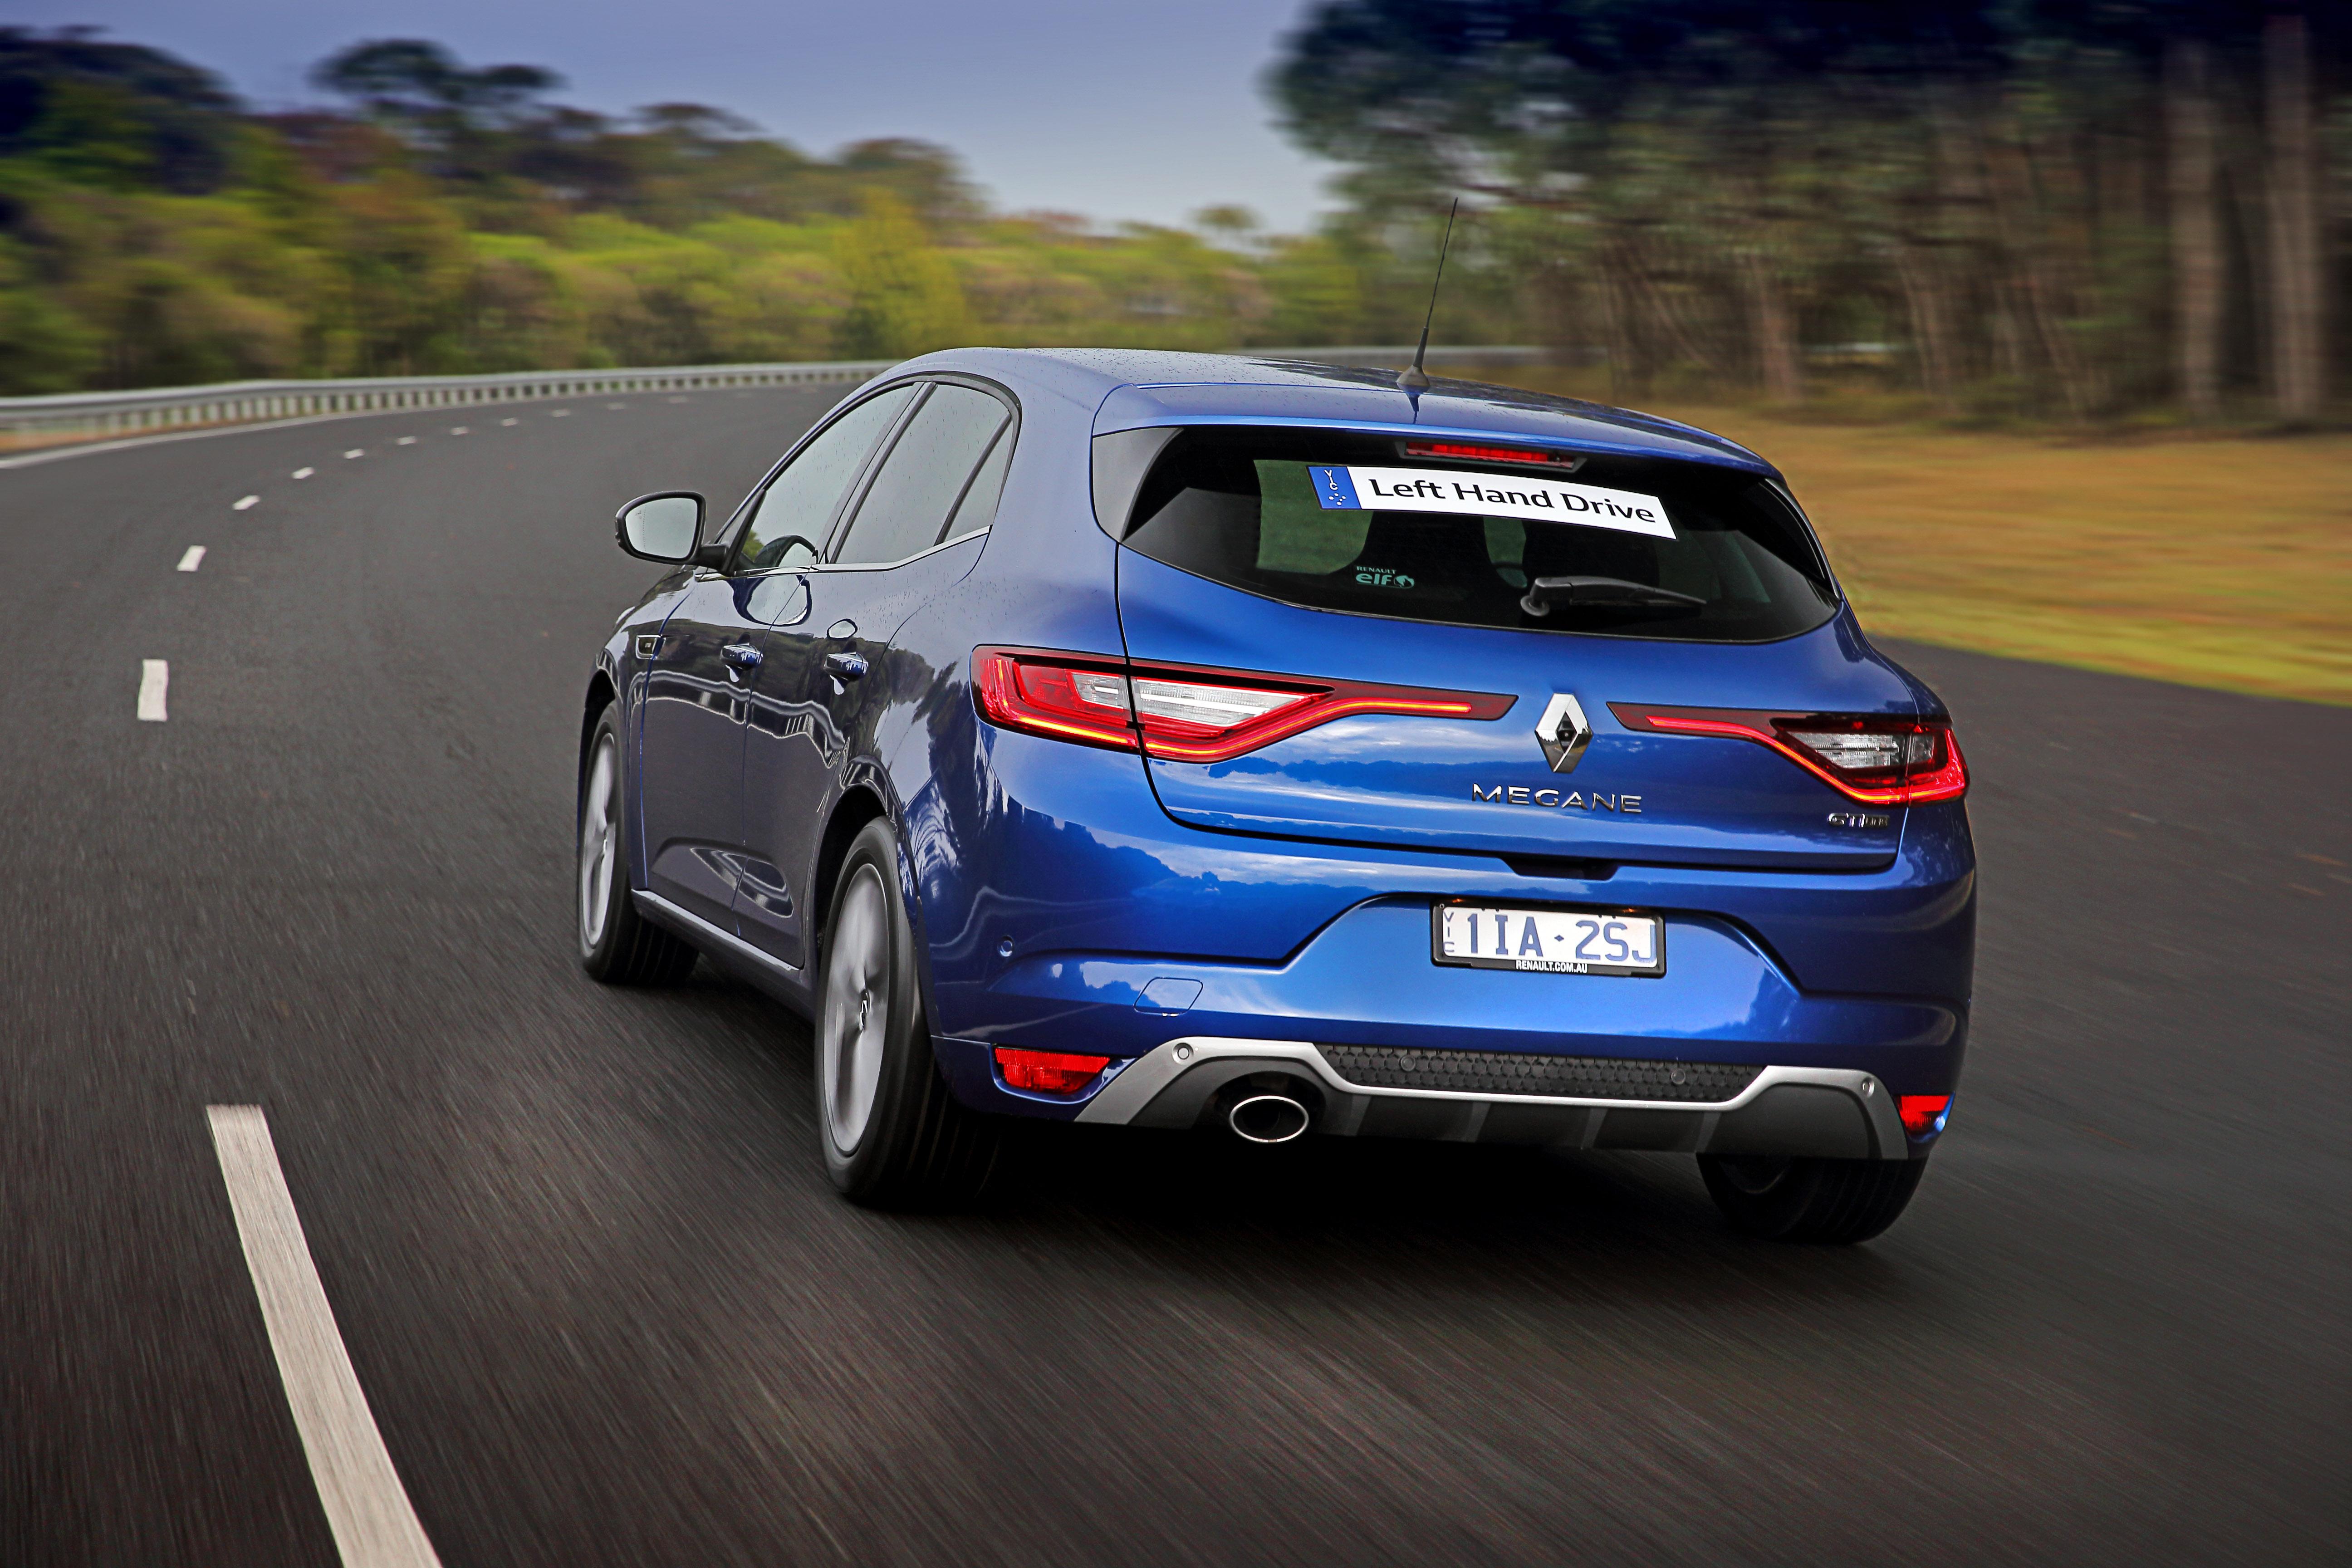 2017 Renault Megane Review: Quick Drive - photos   CarAdvice